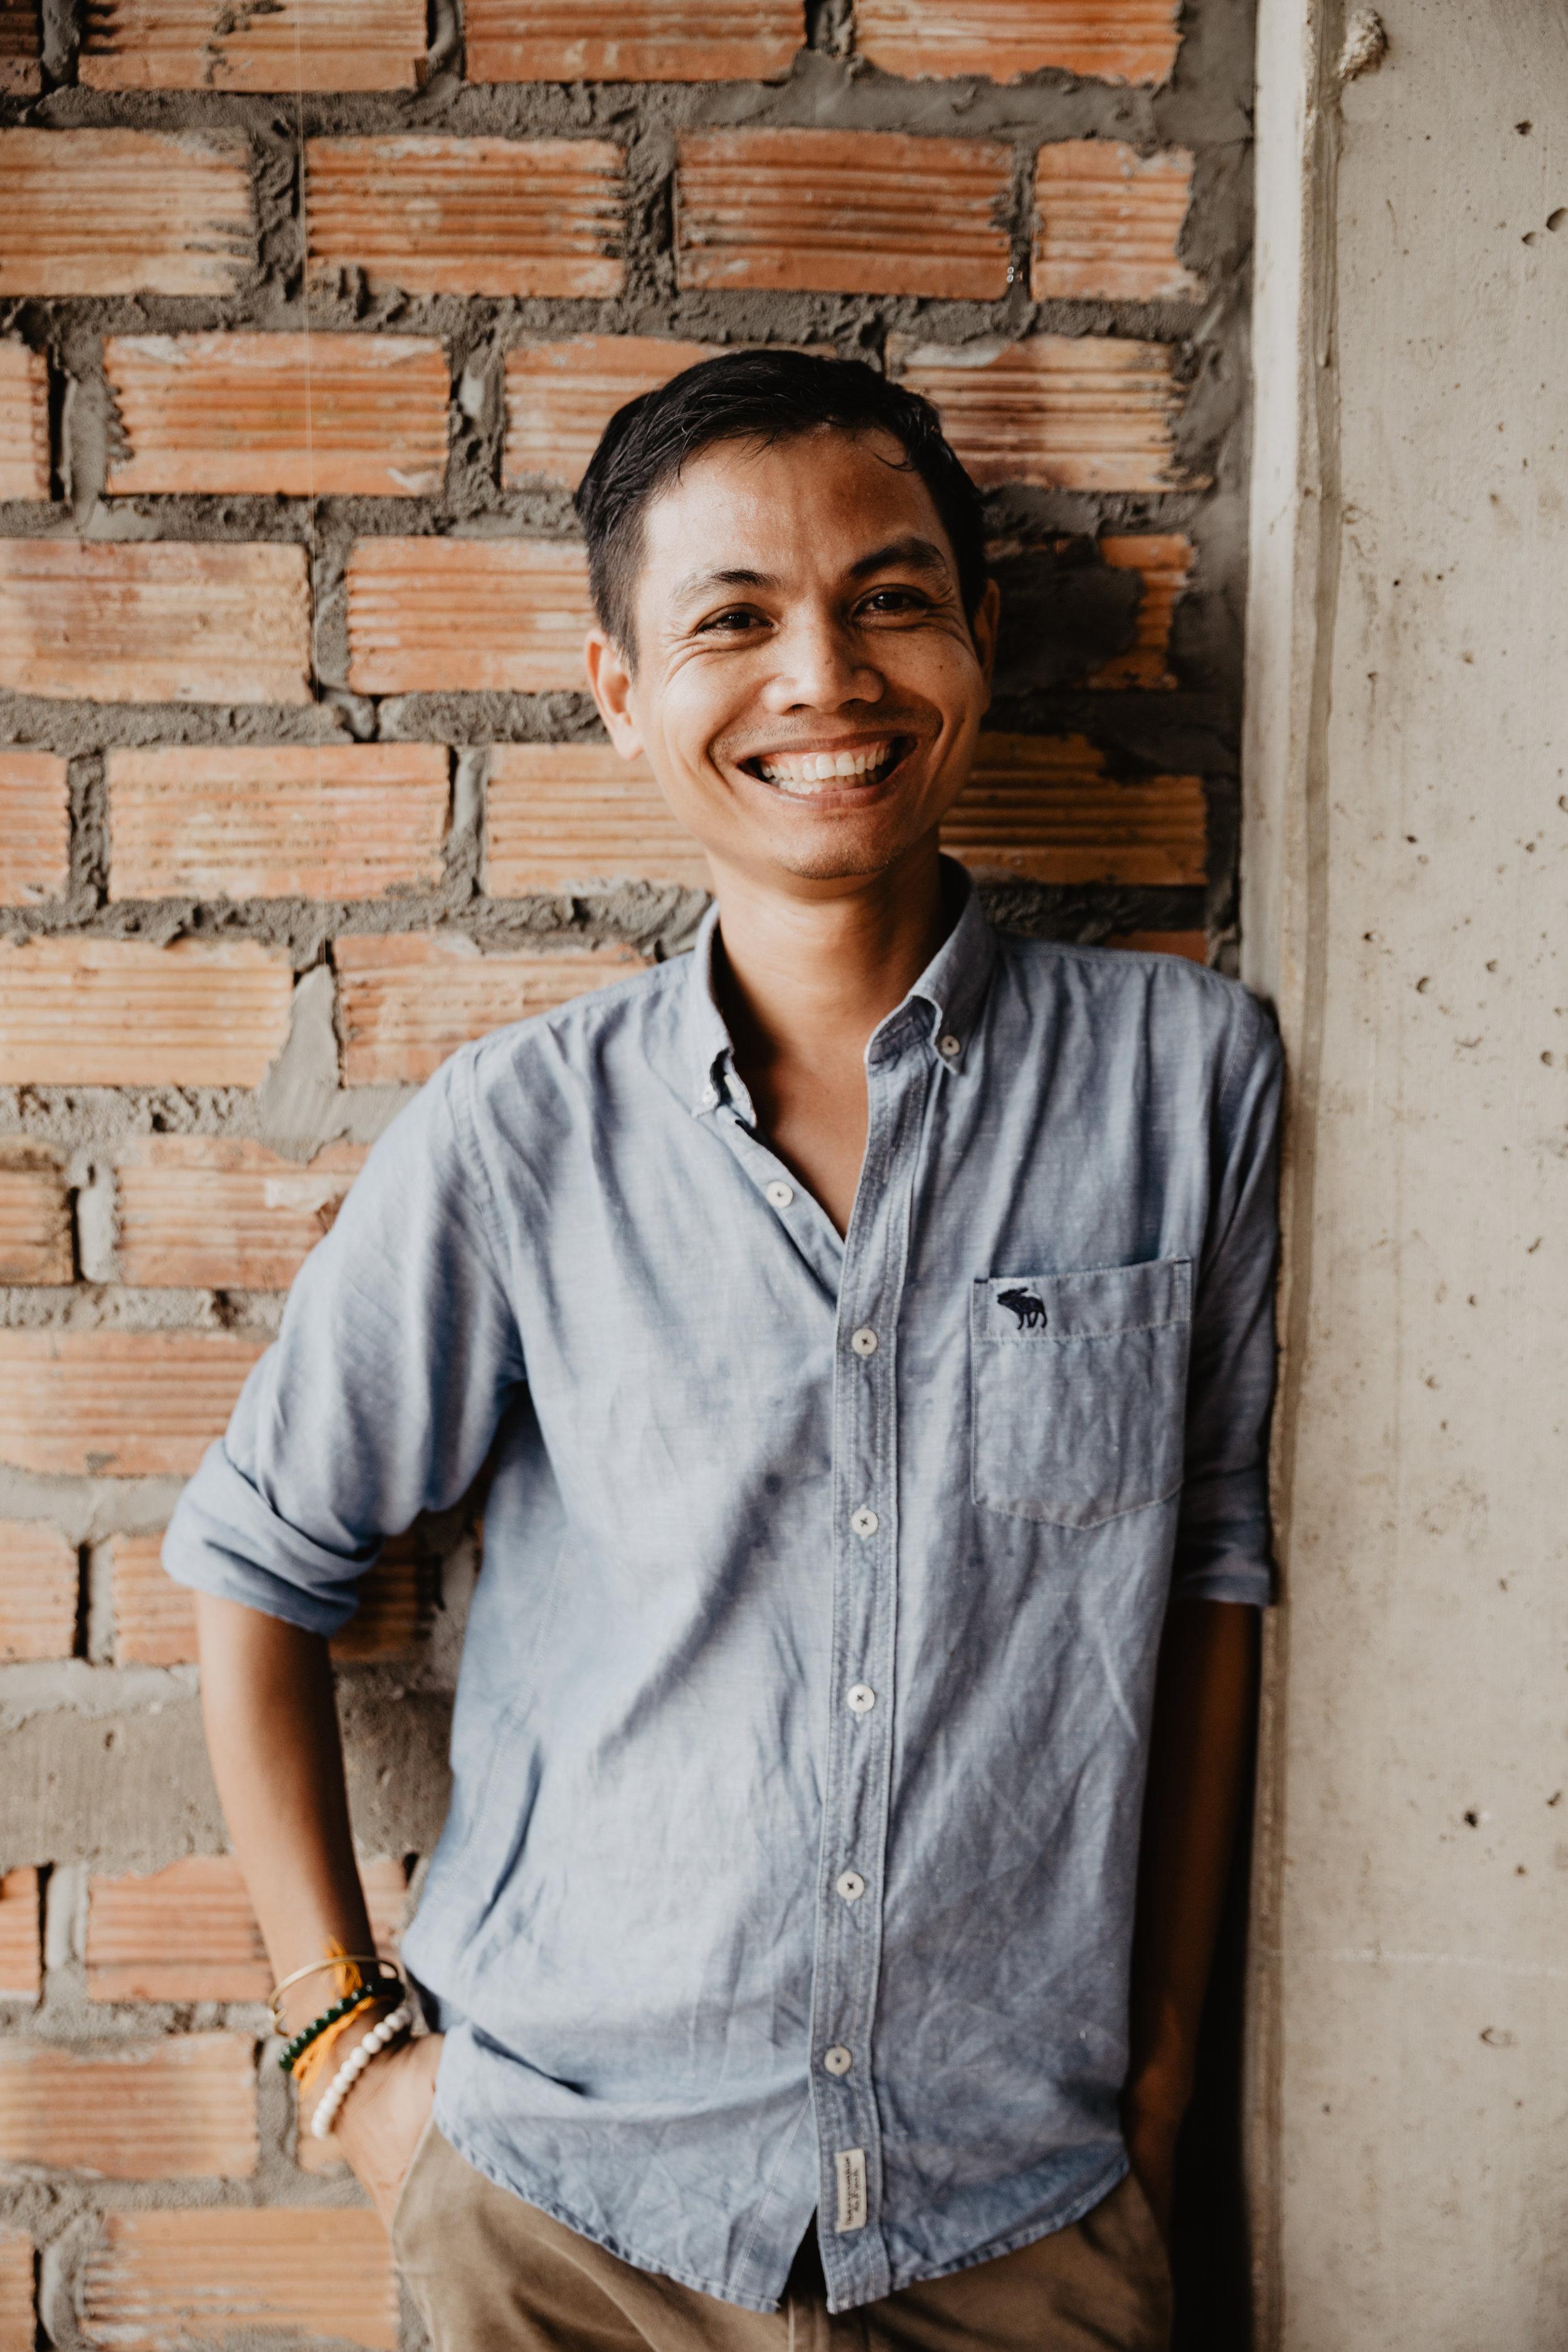 CHOMNAB HO, Managing Partner